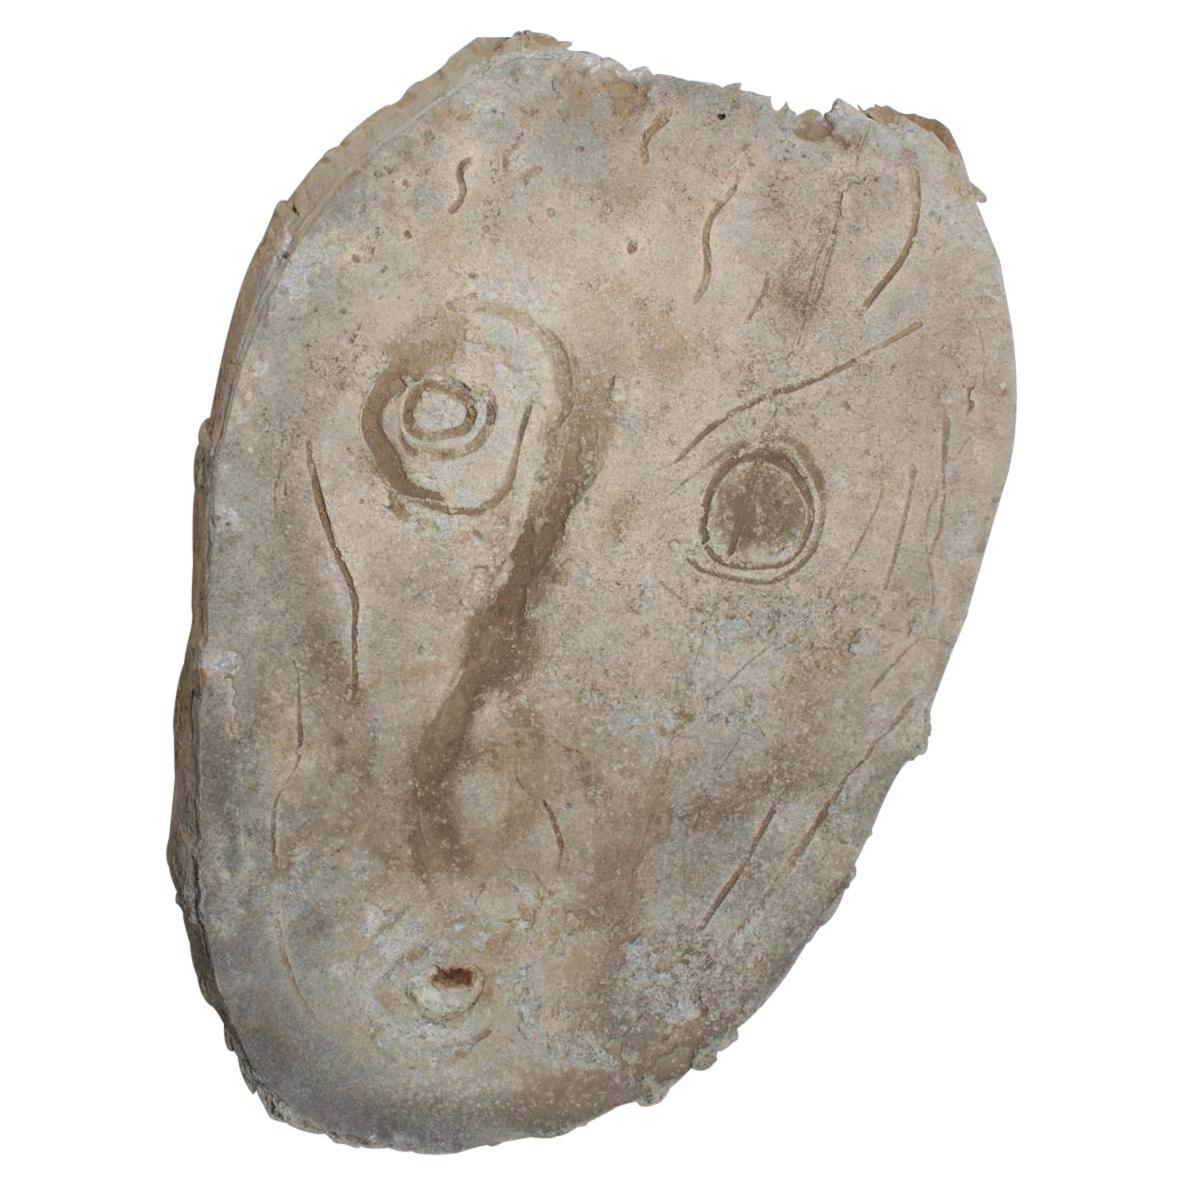 Mid-Century Modern Rare Brutalist Abstract Sculpture Figure Head in Aluminum